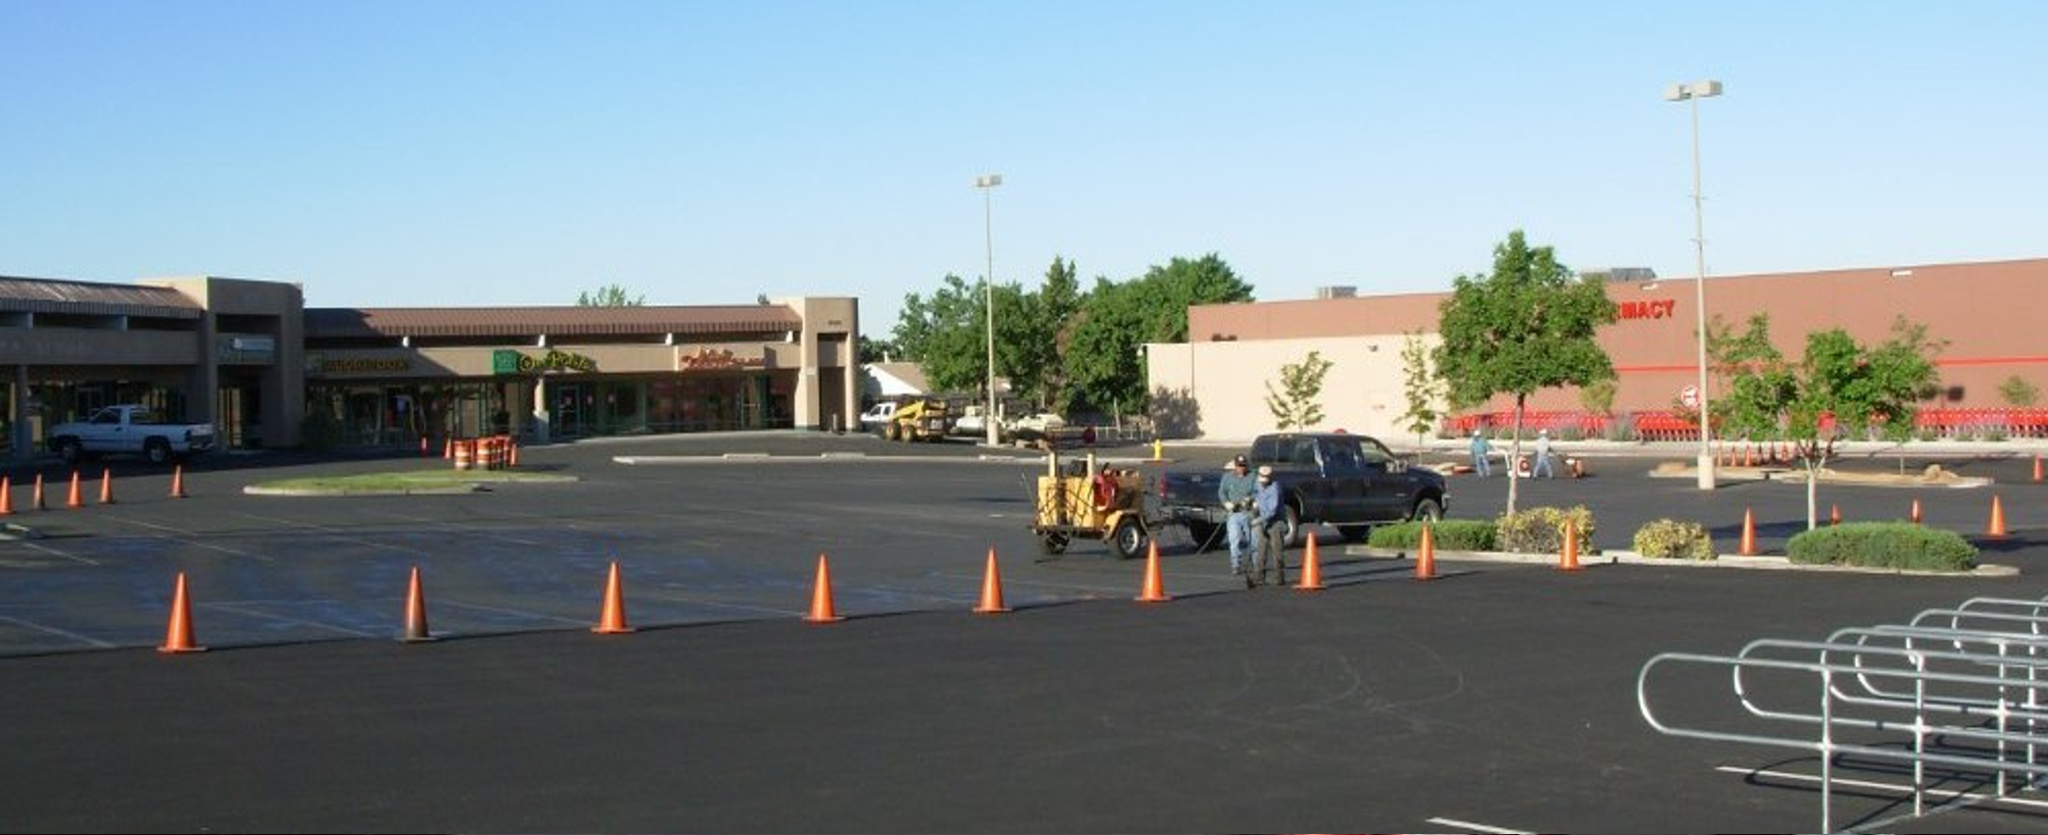 applying a new layer of asphalt